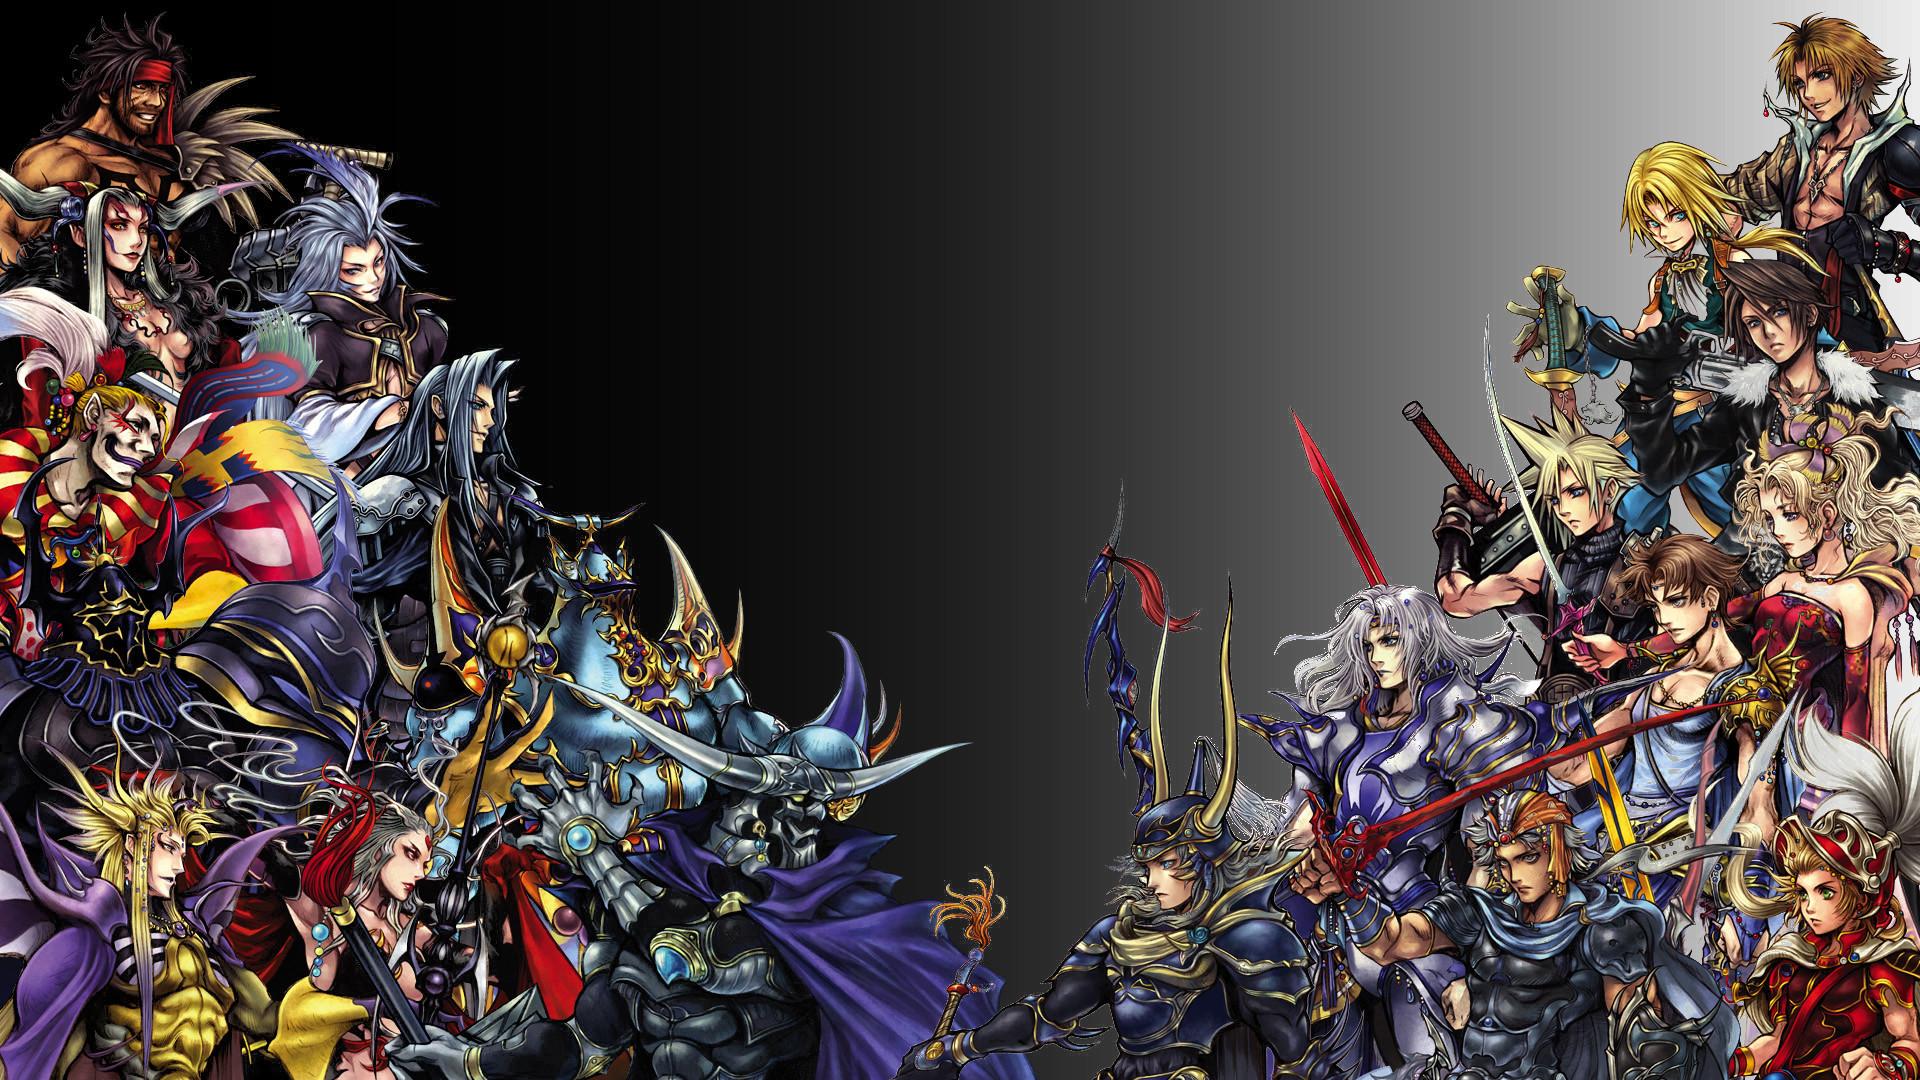 Final Fantasy HD Wallpaper (81+ Images